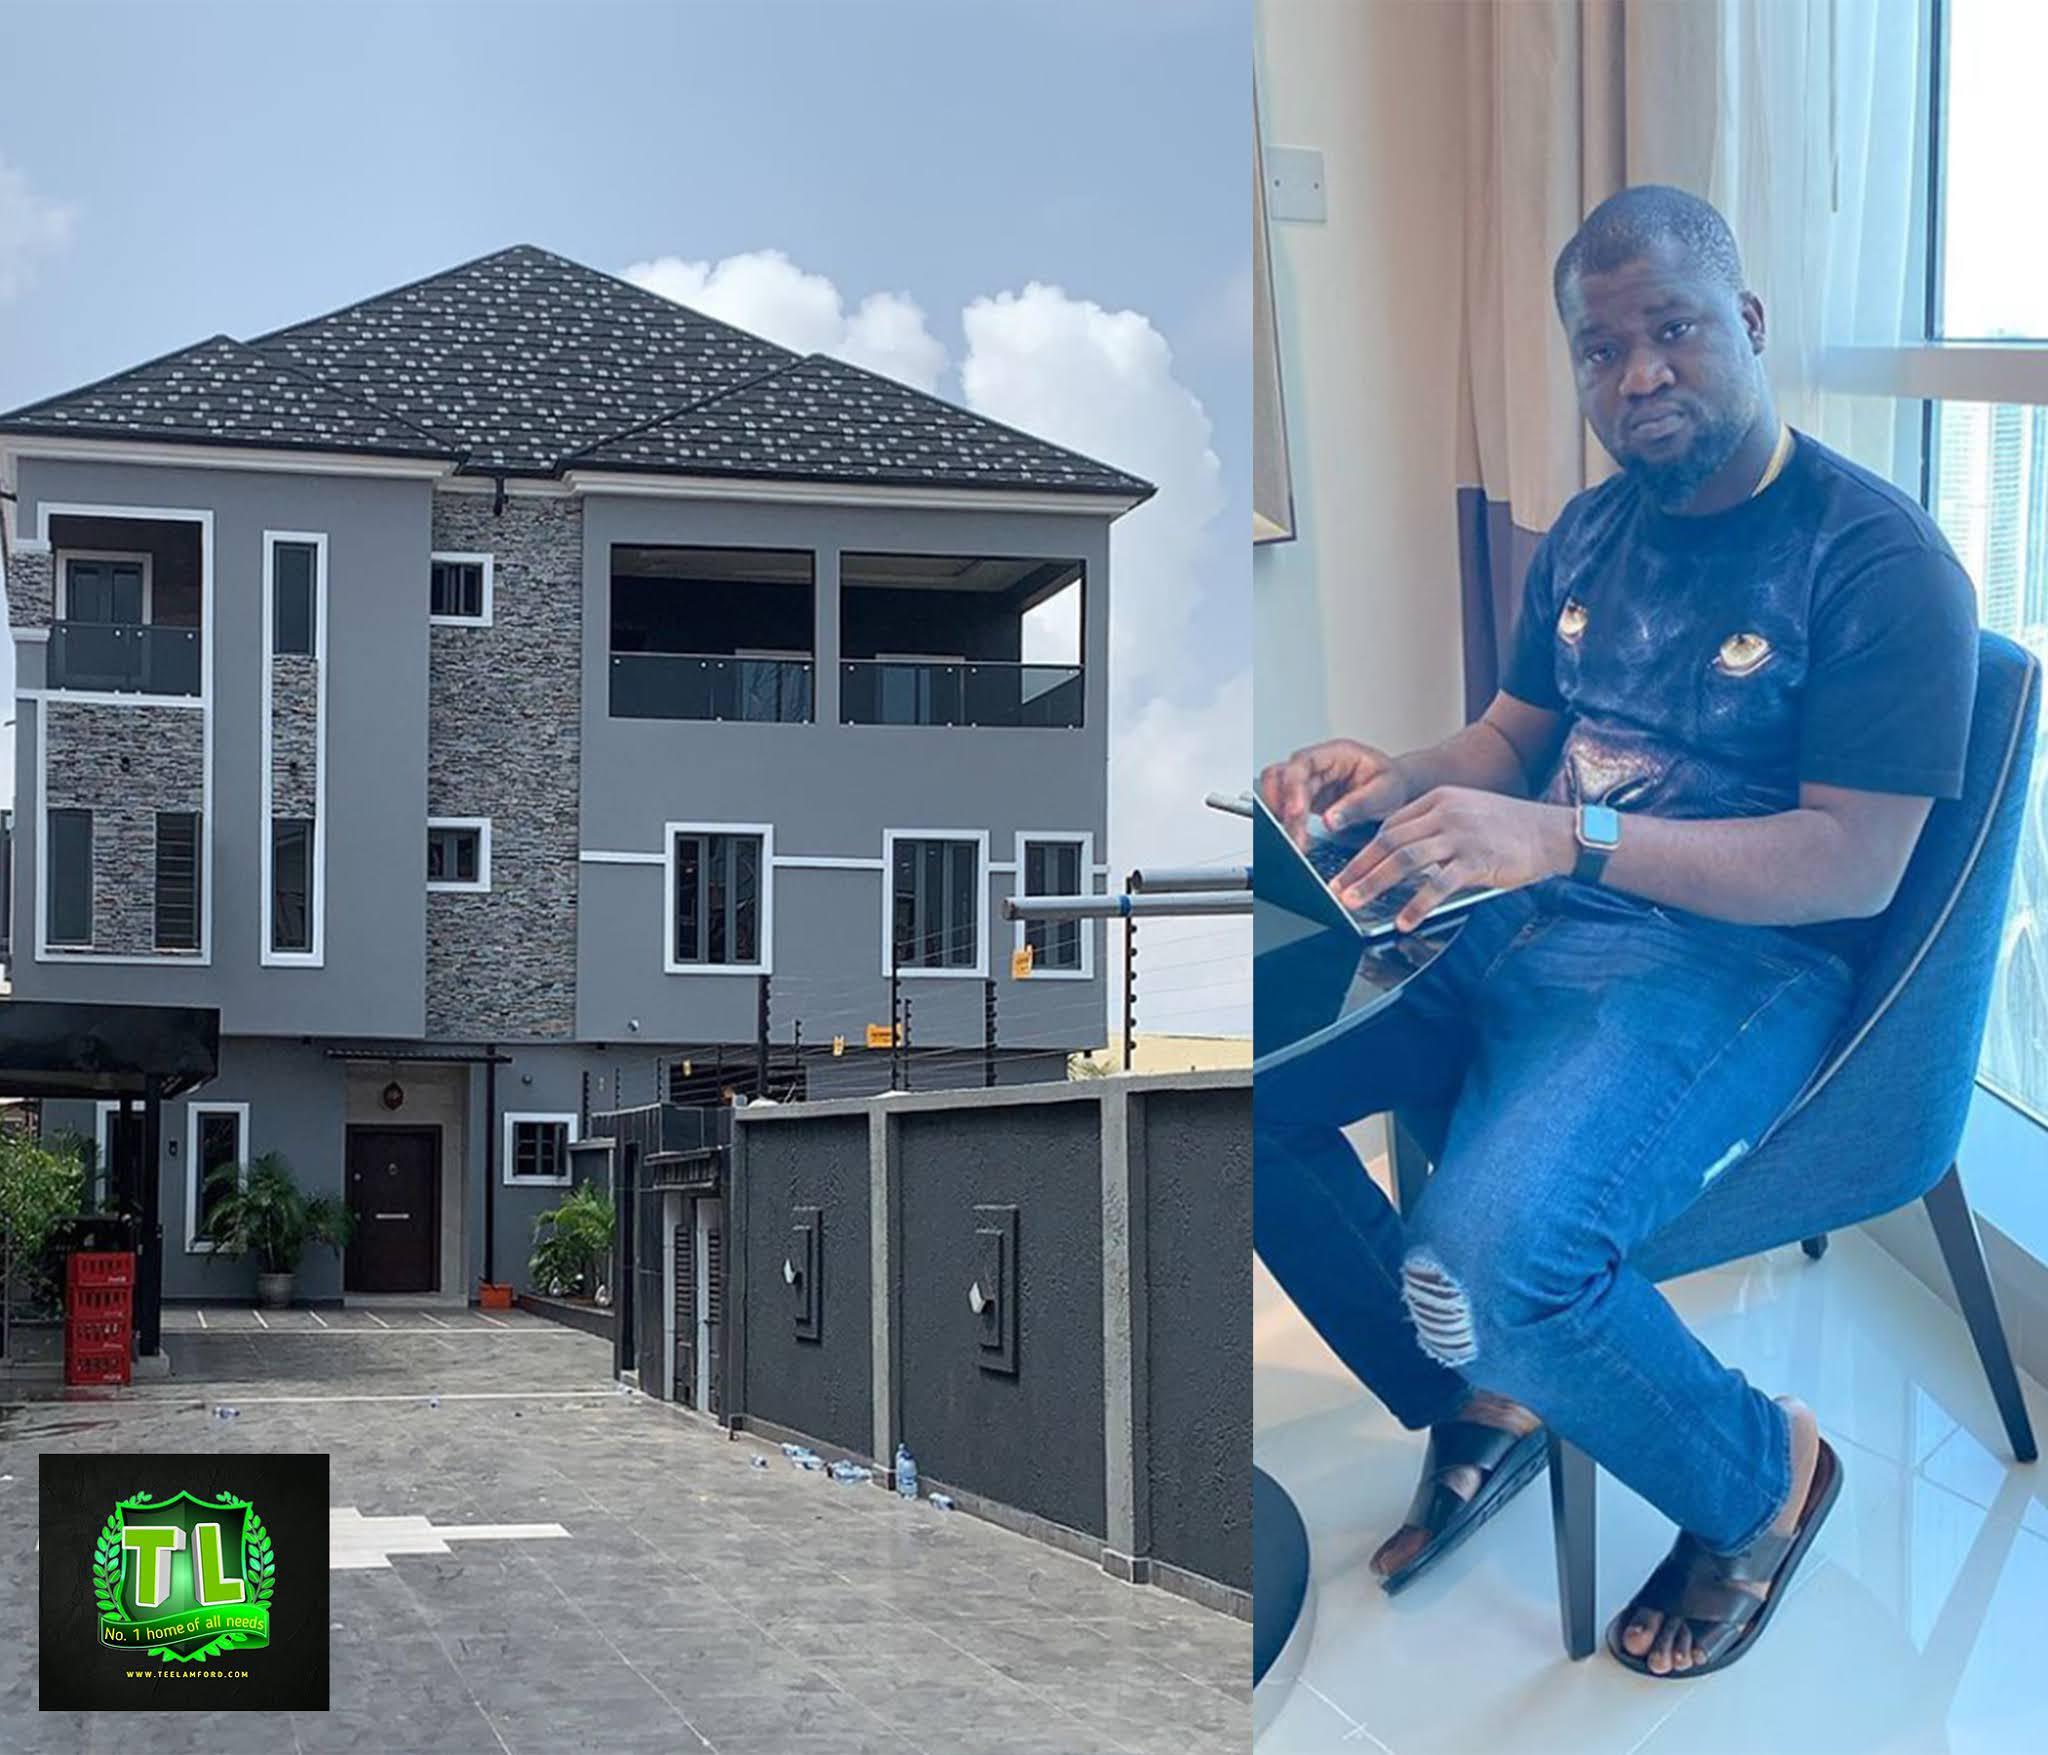 Congratulations-Nigerian-Blogger-Makinde-Azeez-Acquired-Brand-New-Mansion-Teelamford